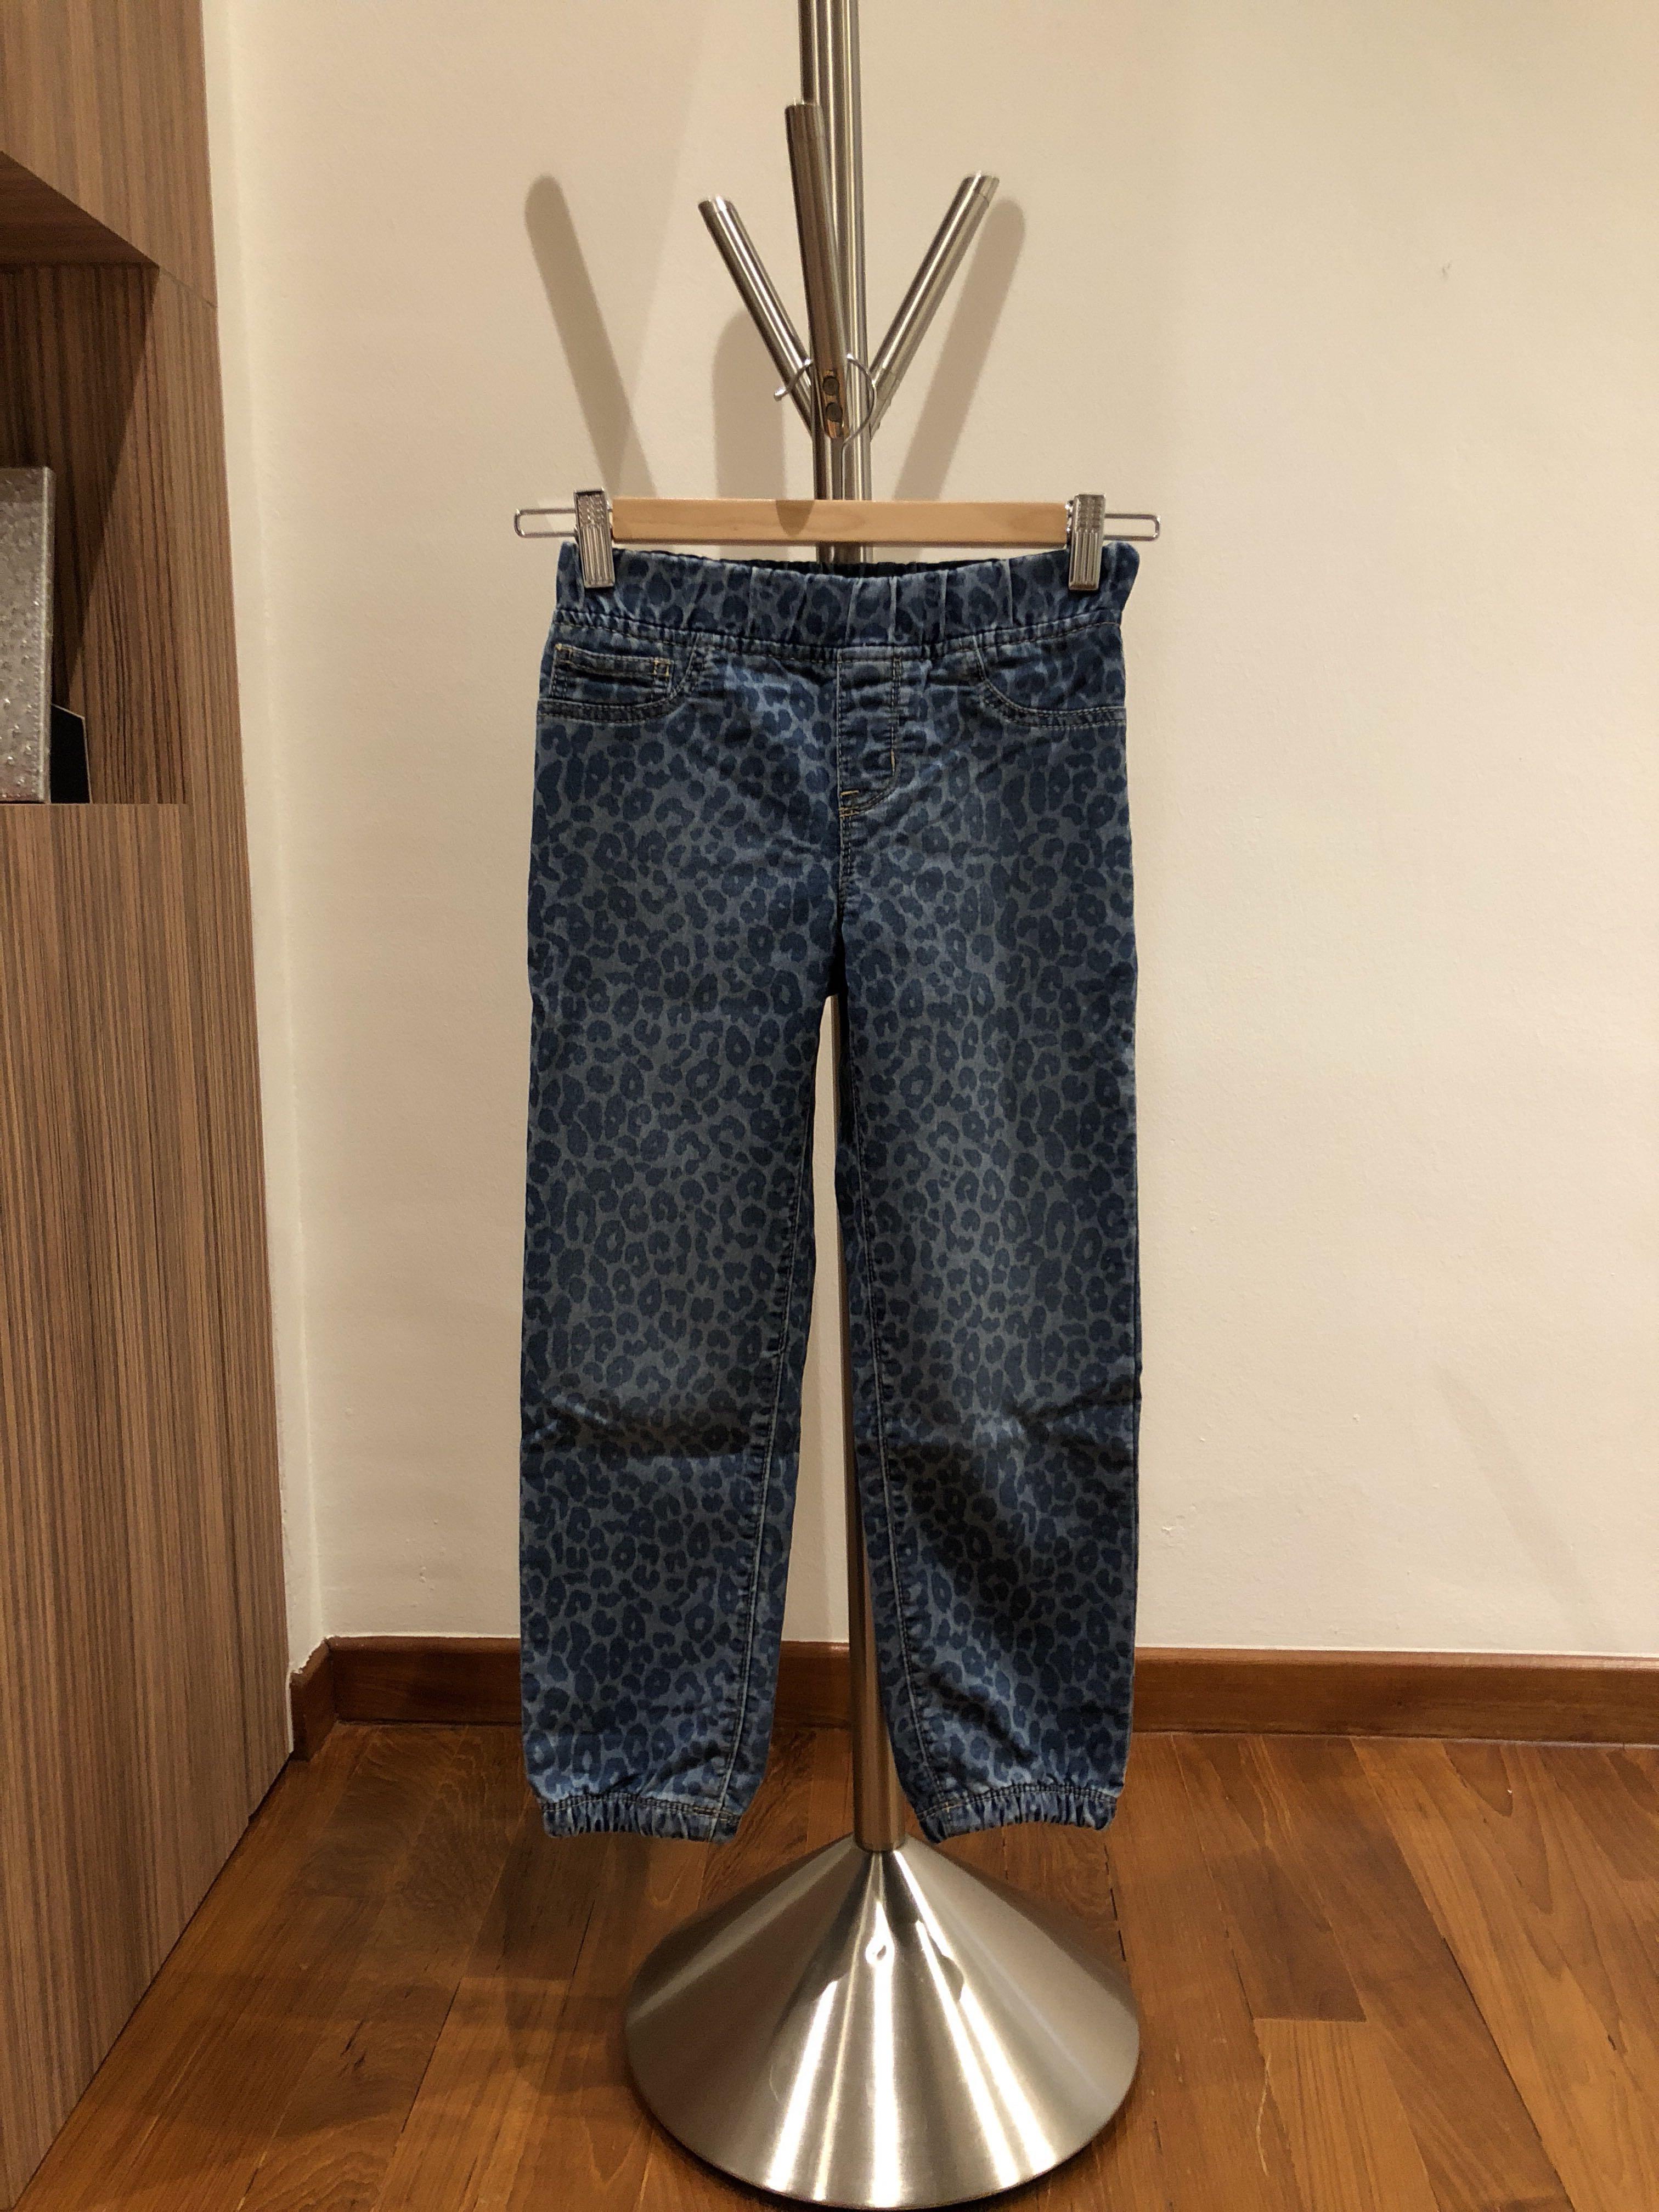 Gap Kids GapKids Overall Super Soft Jean Denim Size Large